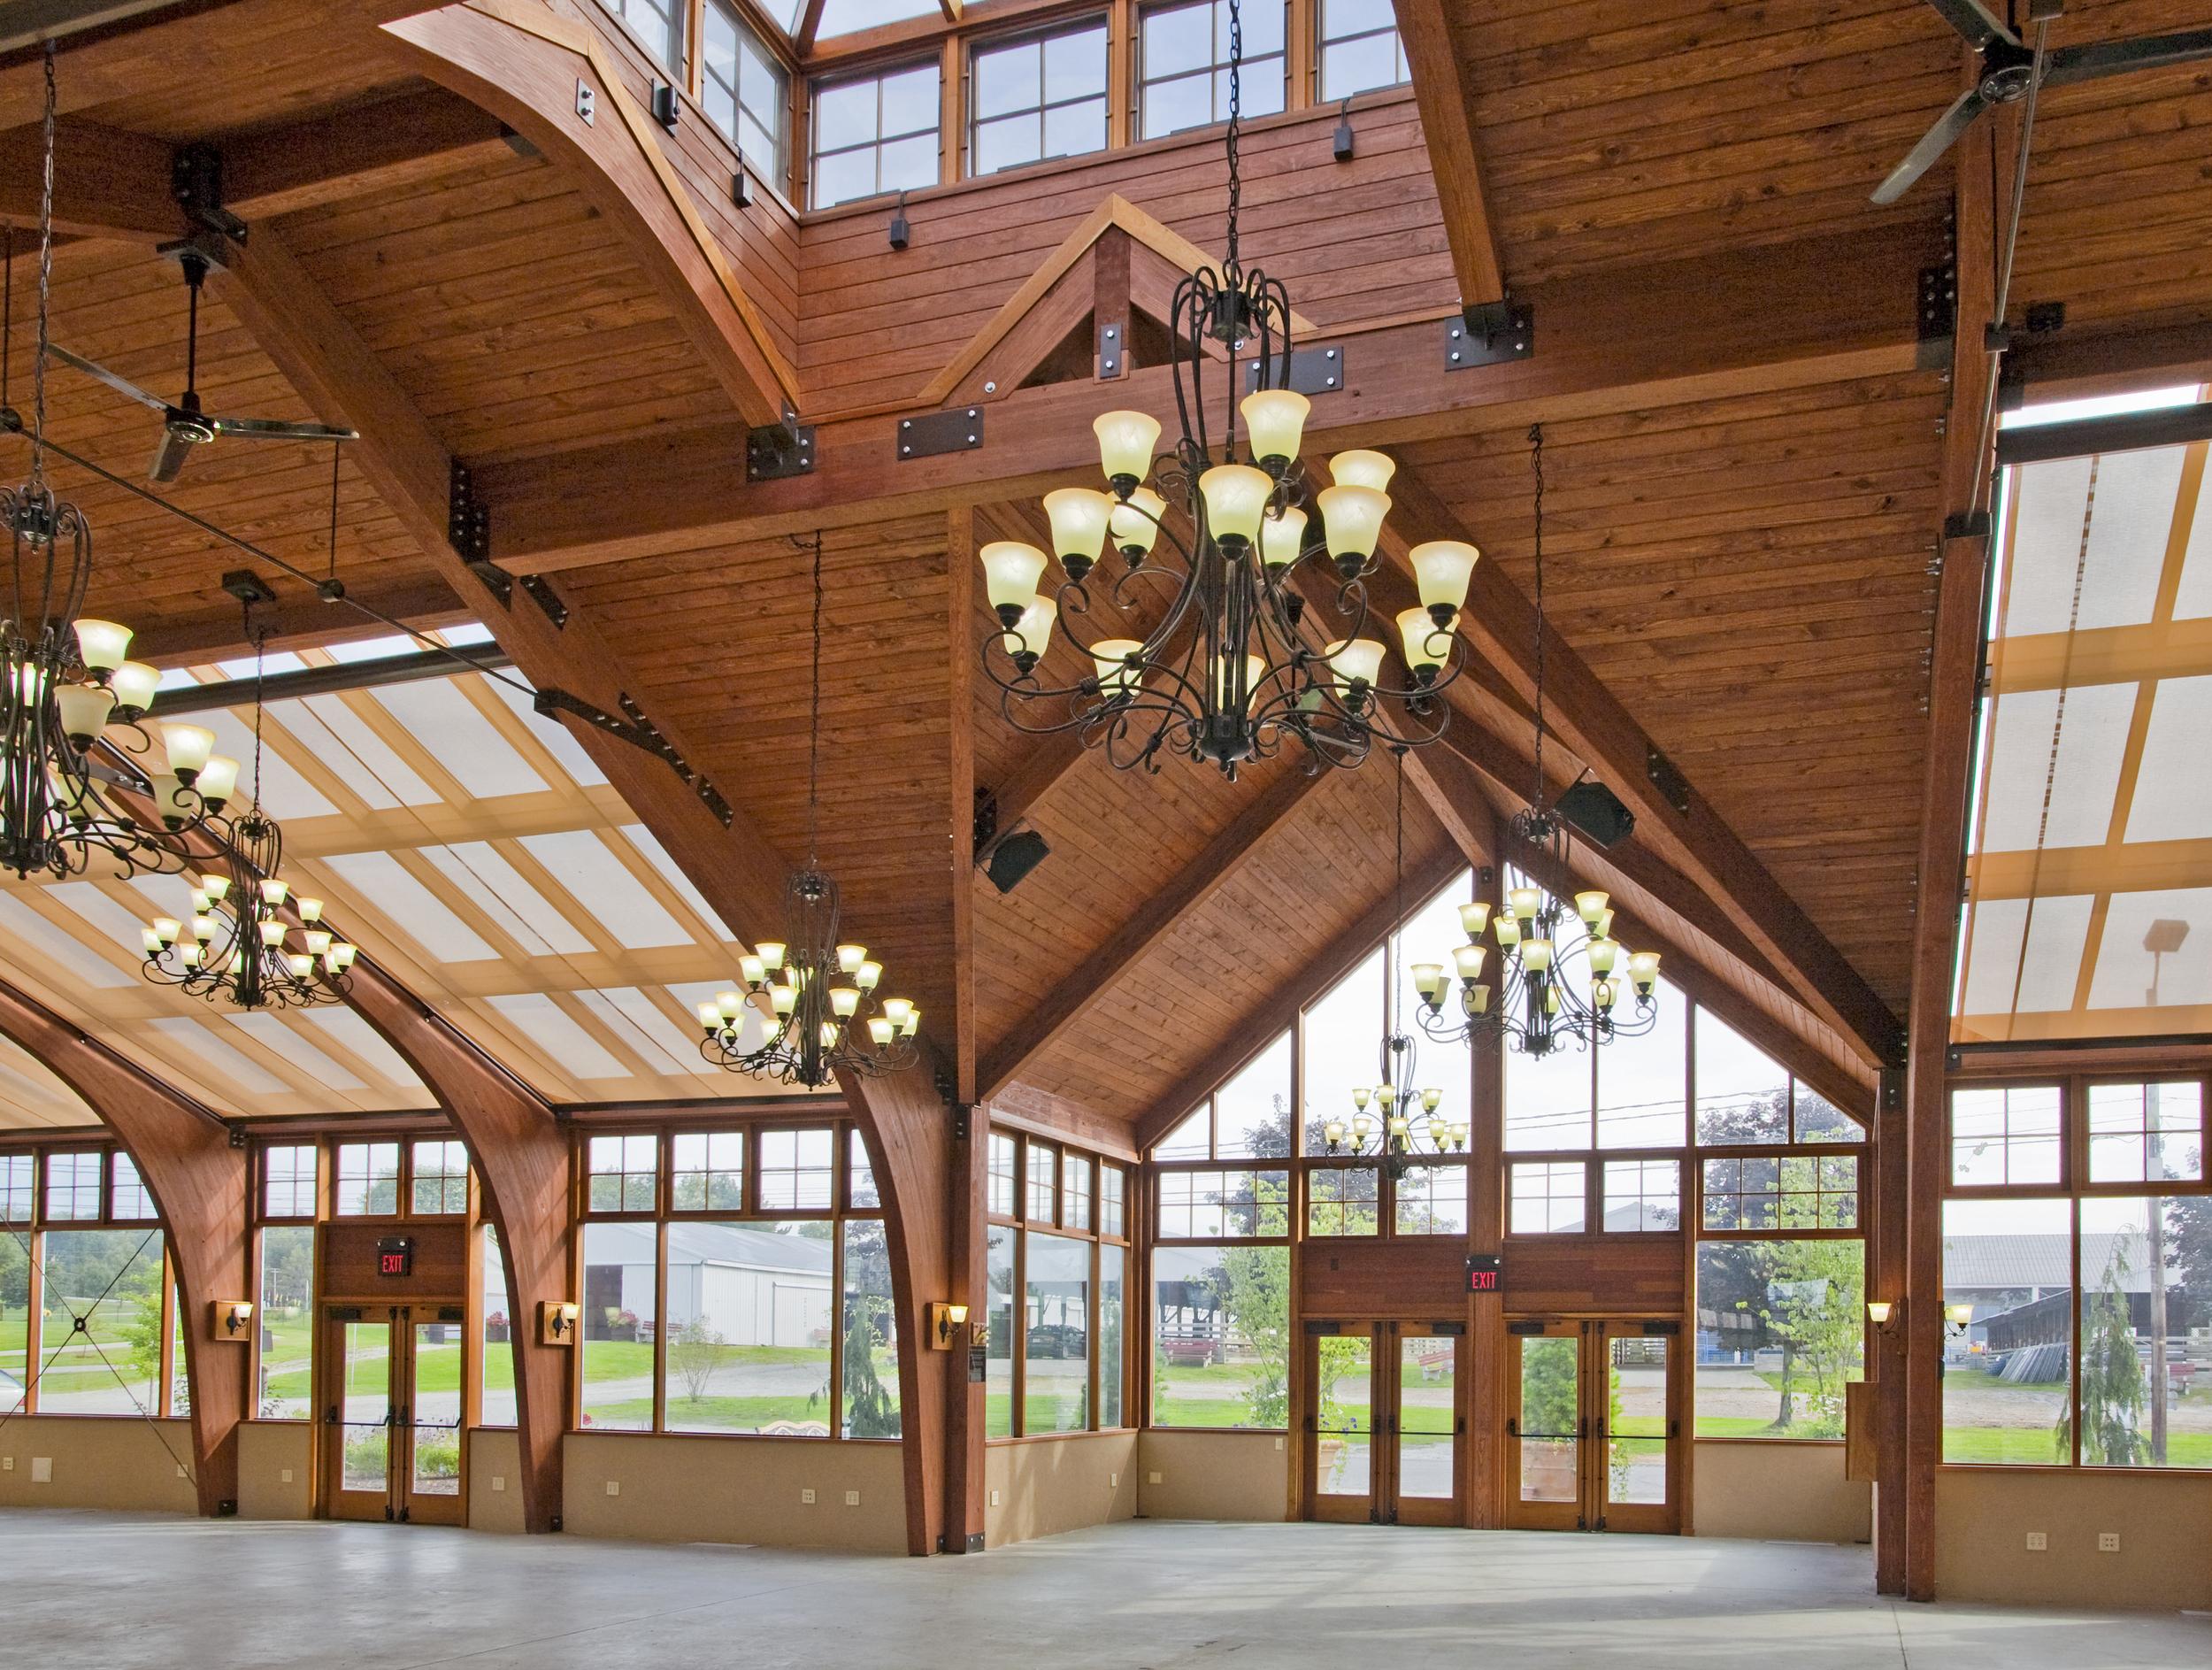 Banquet Hall Conservatory (Interior)